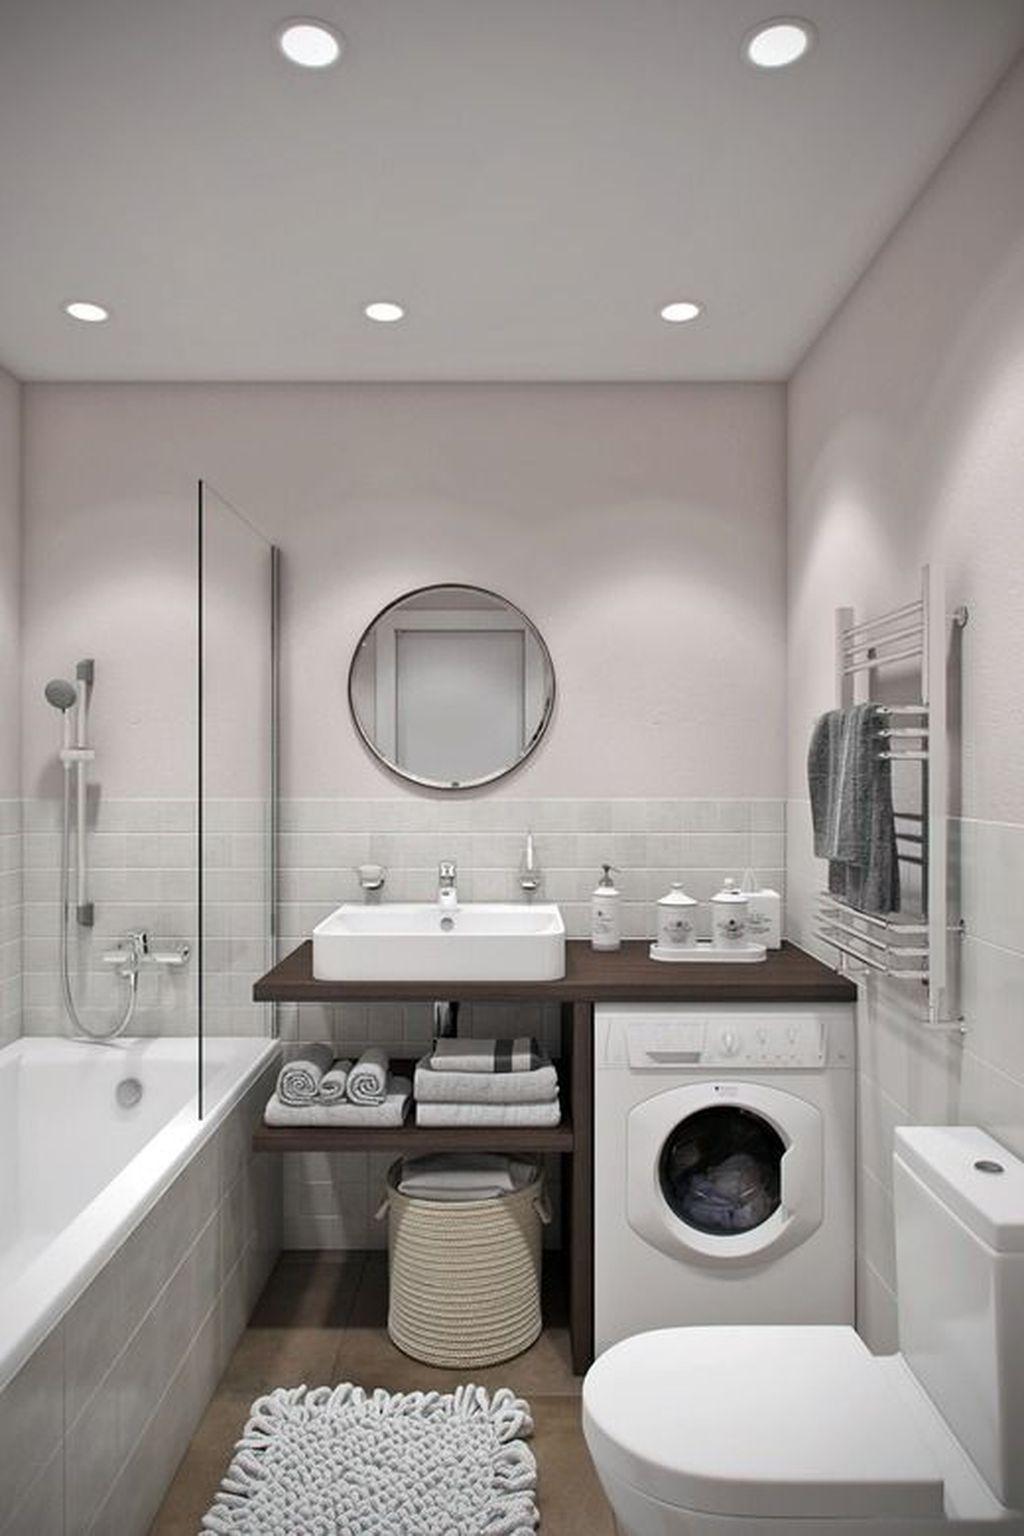 40 the best small bathroom design ideas to make it look larger id e salle de bain salle de